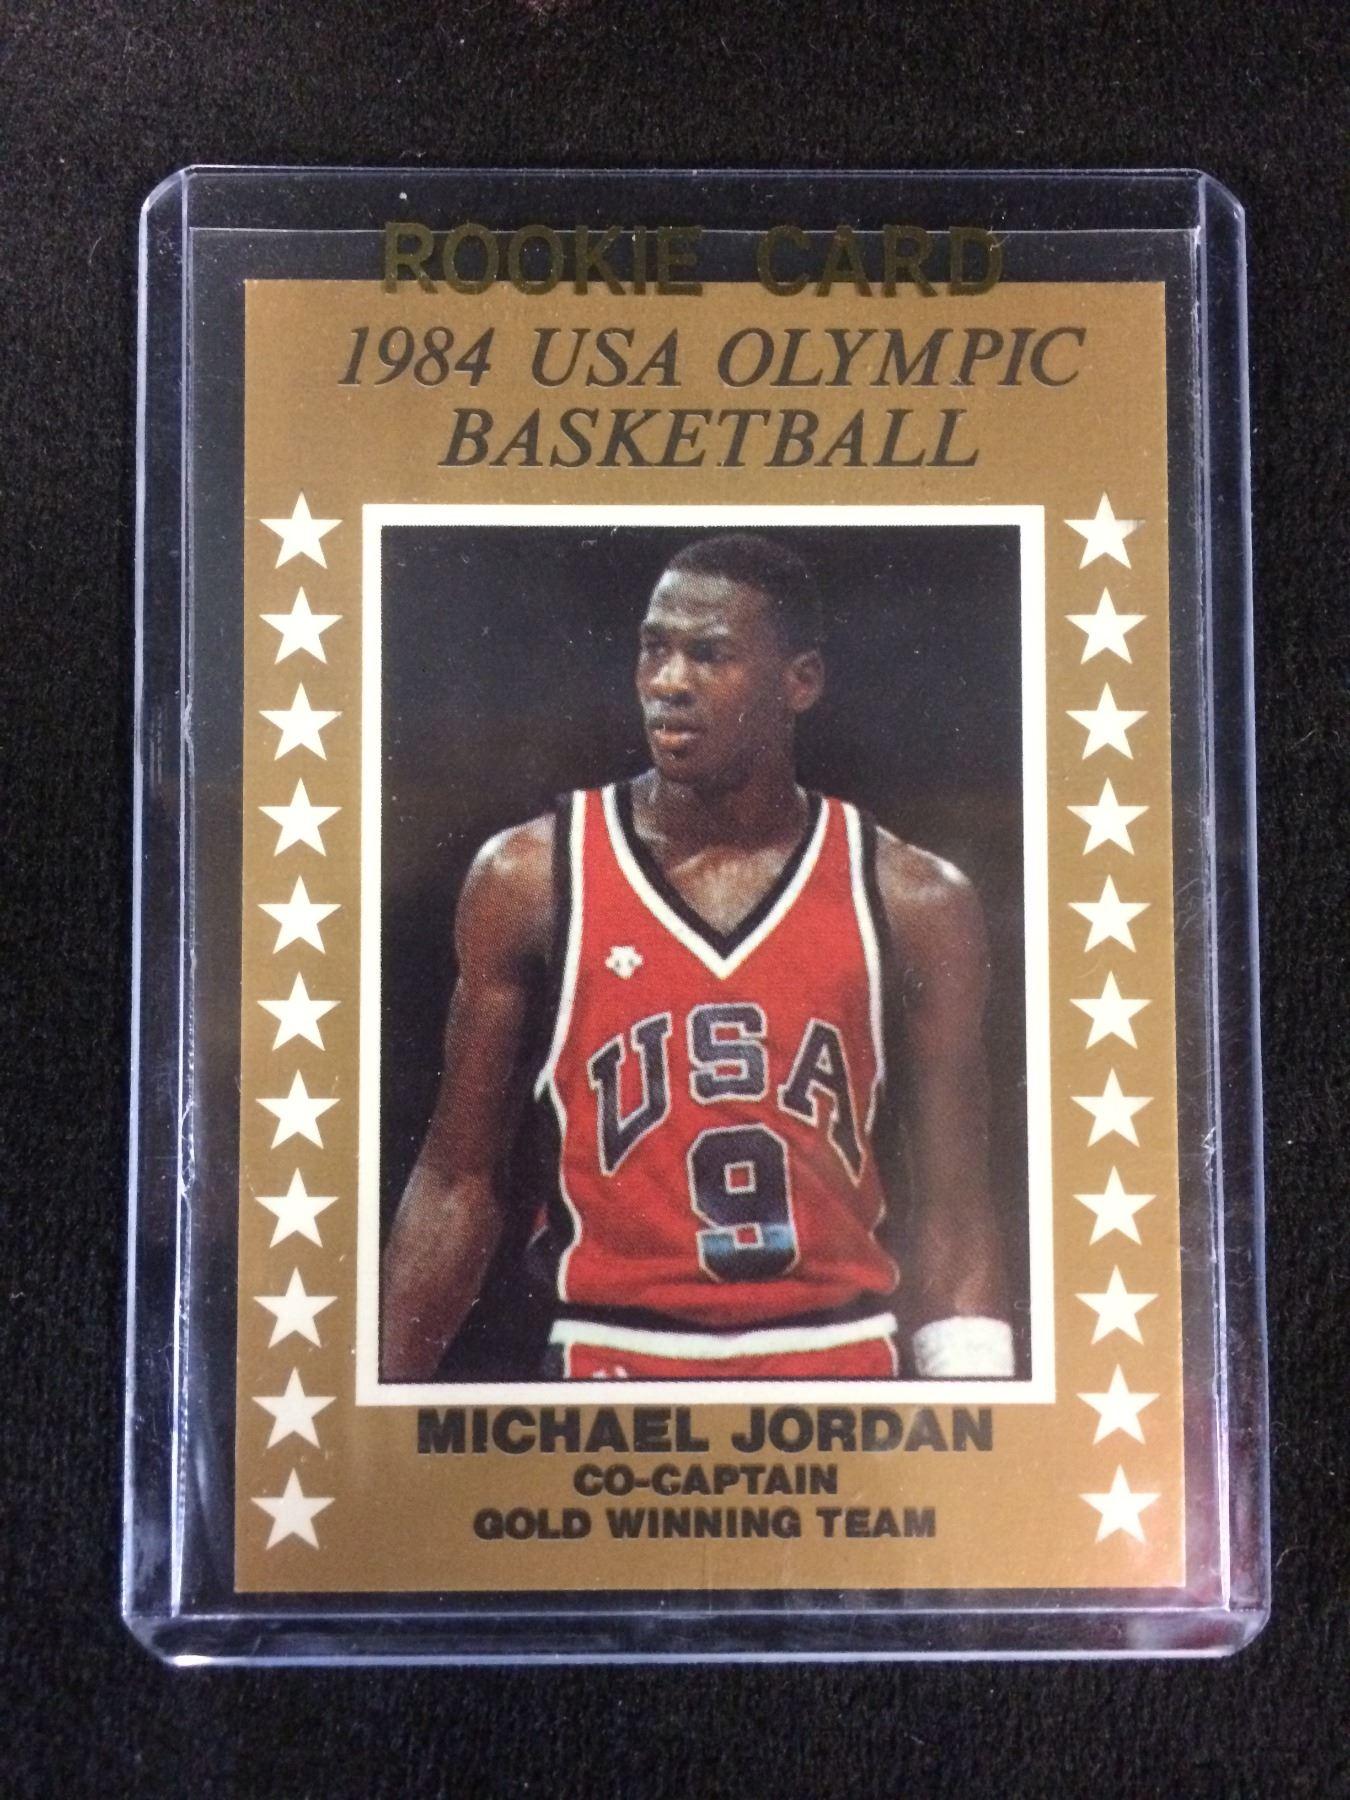 online retailer 05039 38391 1984 USA OLYMPIC BASKETBALL CO-CAPTAIN GOLD WINNING TEAM MICHAEL JORDAN